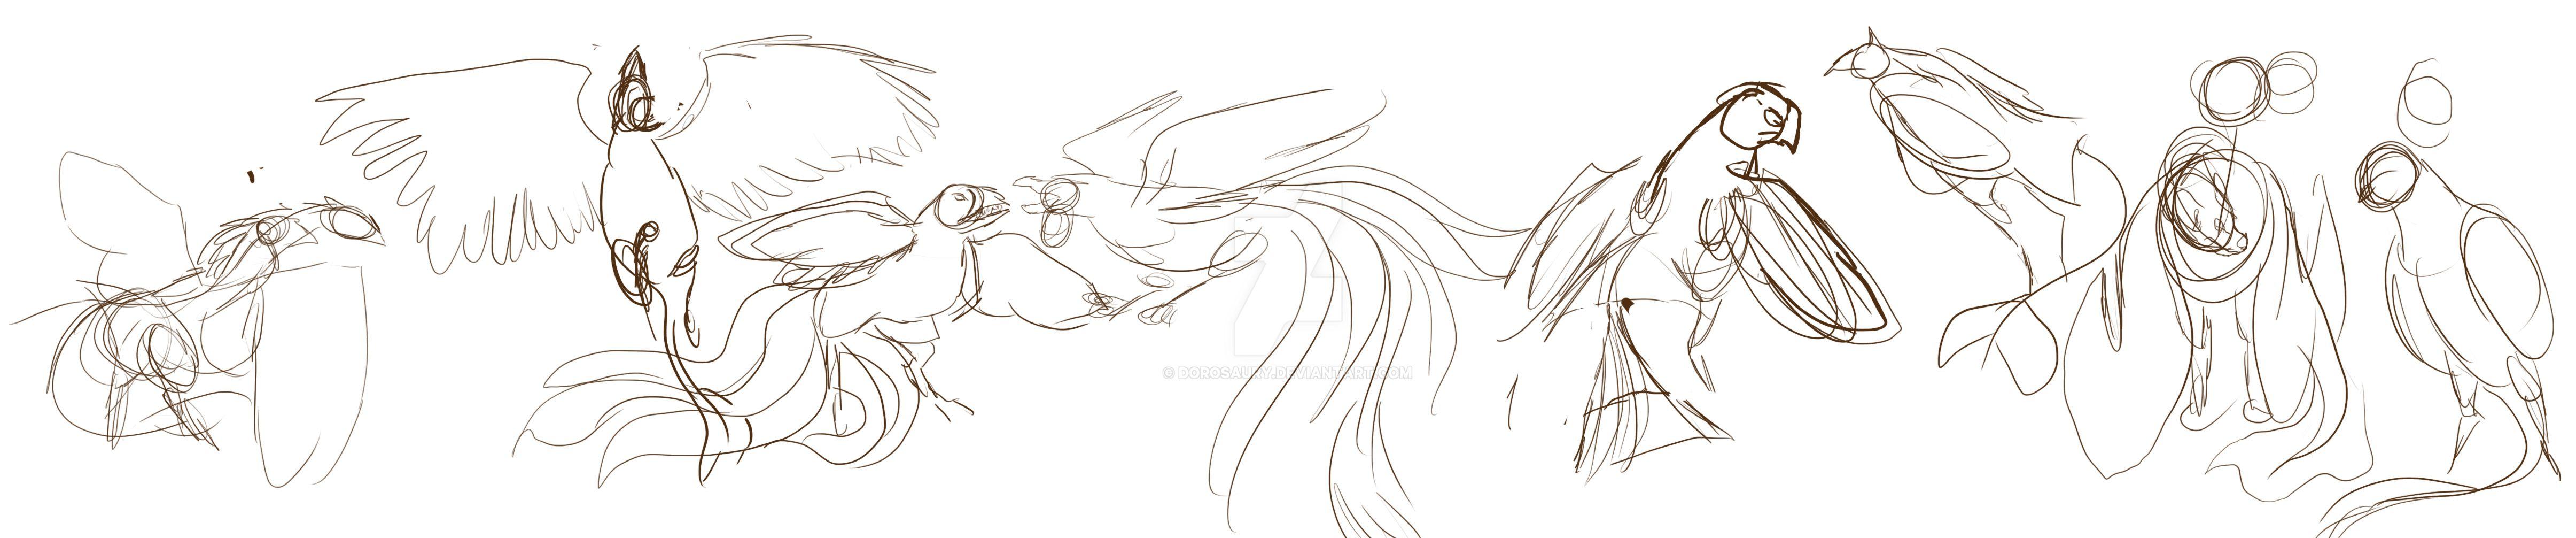 Nocturnal Birds by Dorosaury